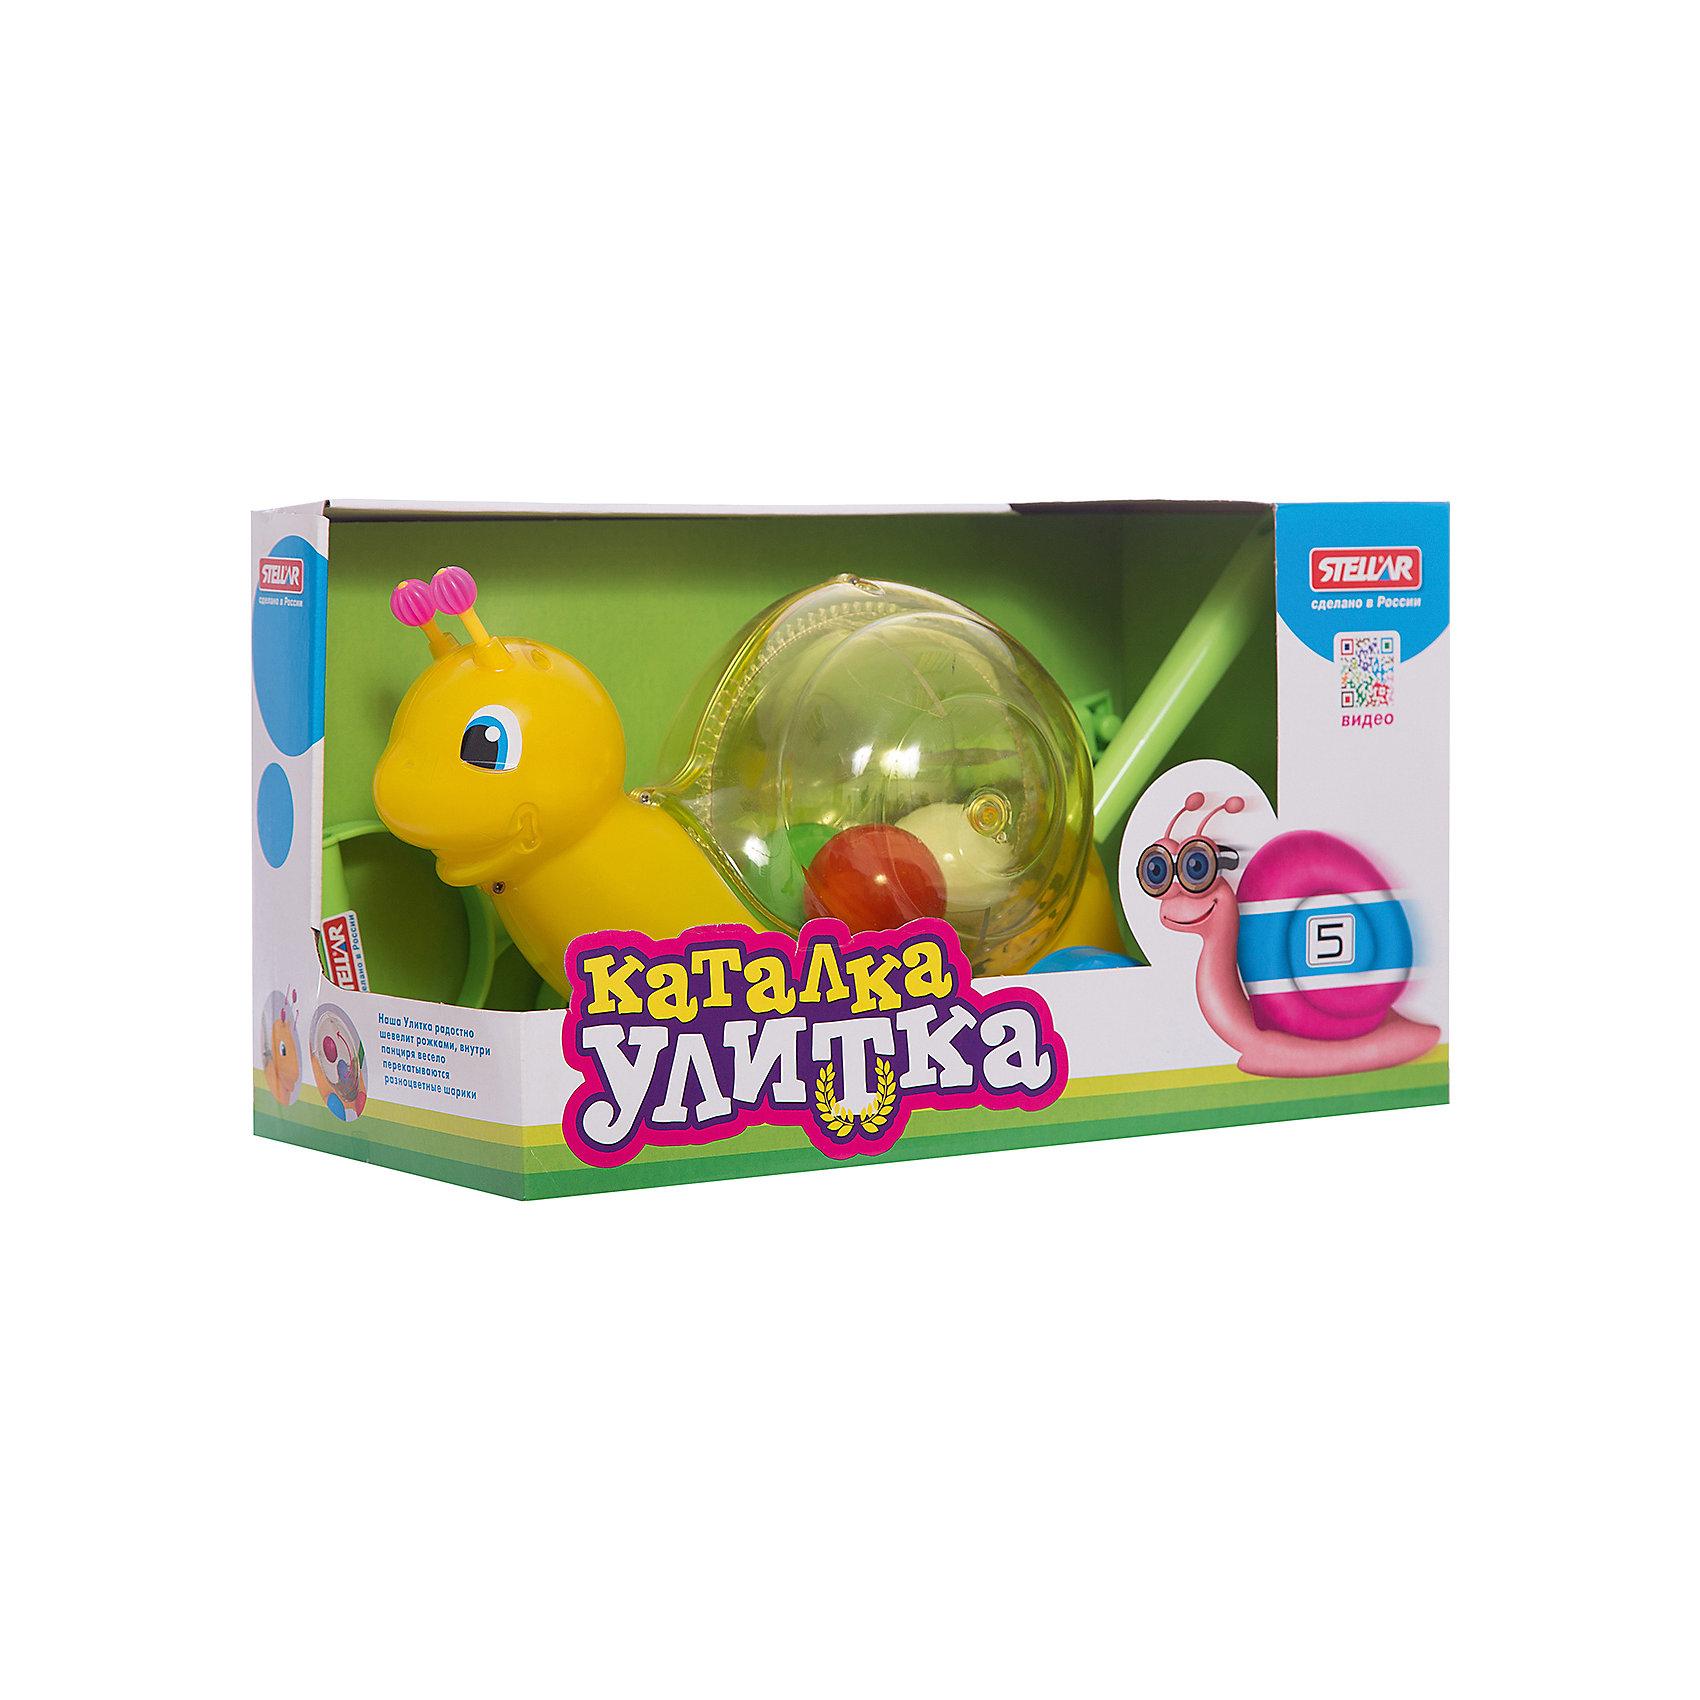 Стеллар Каталка Улитка, Стеллар музыкальные игрушки стеллар дудочка